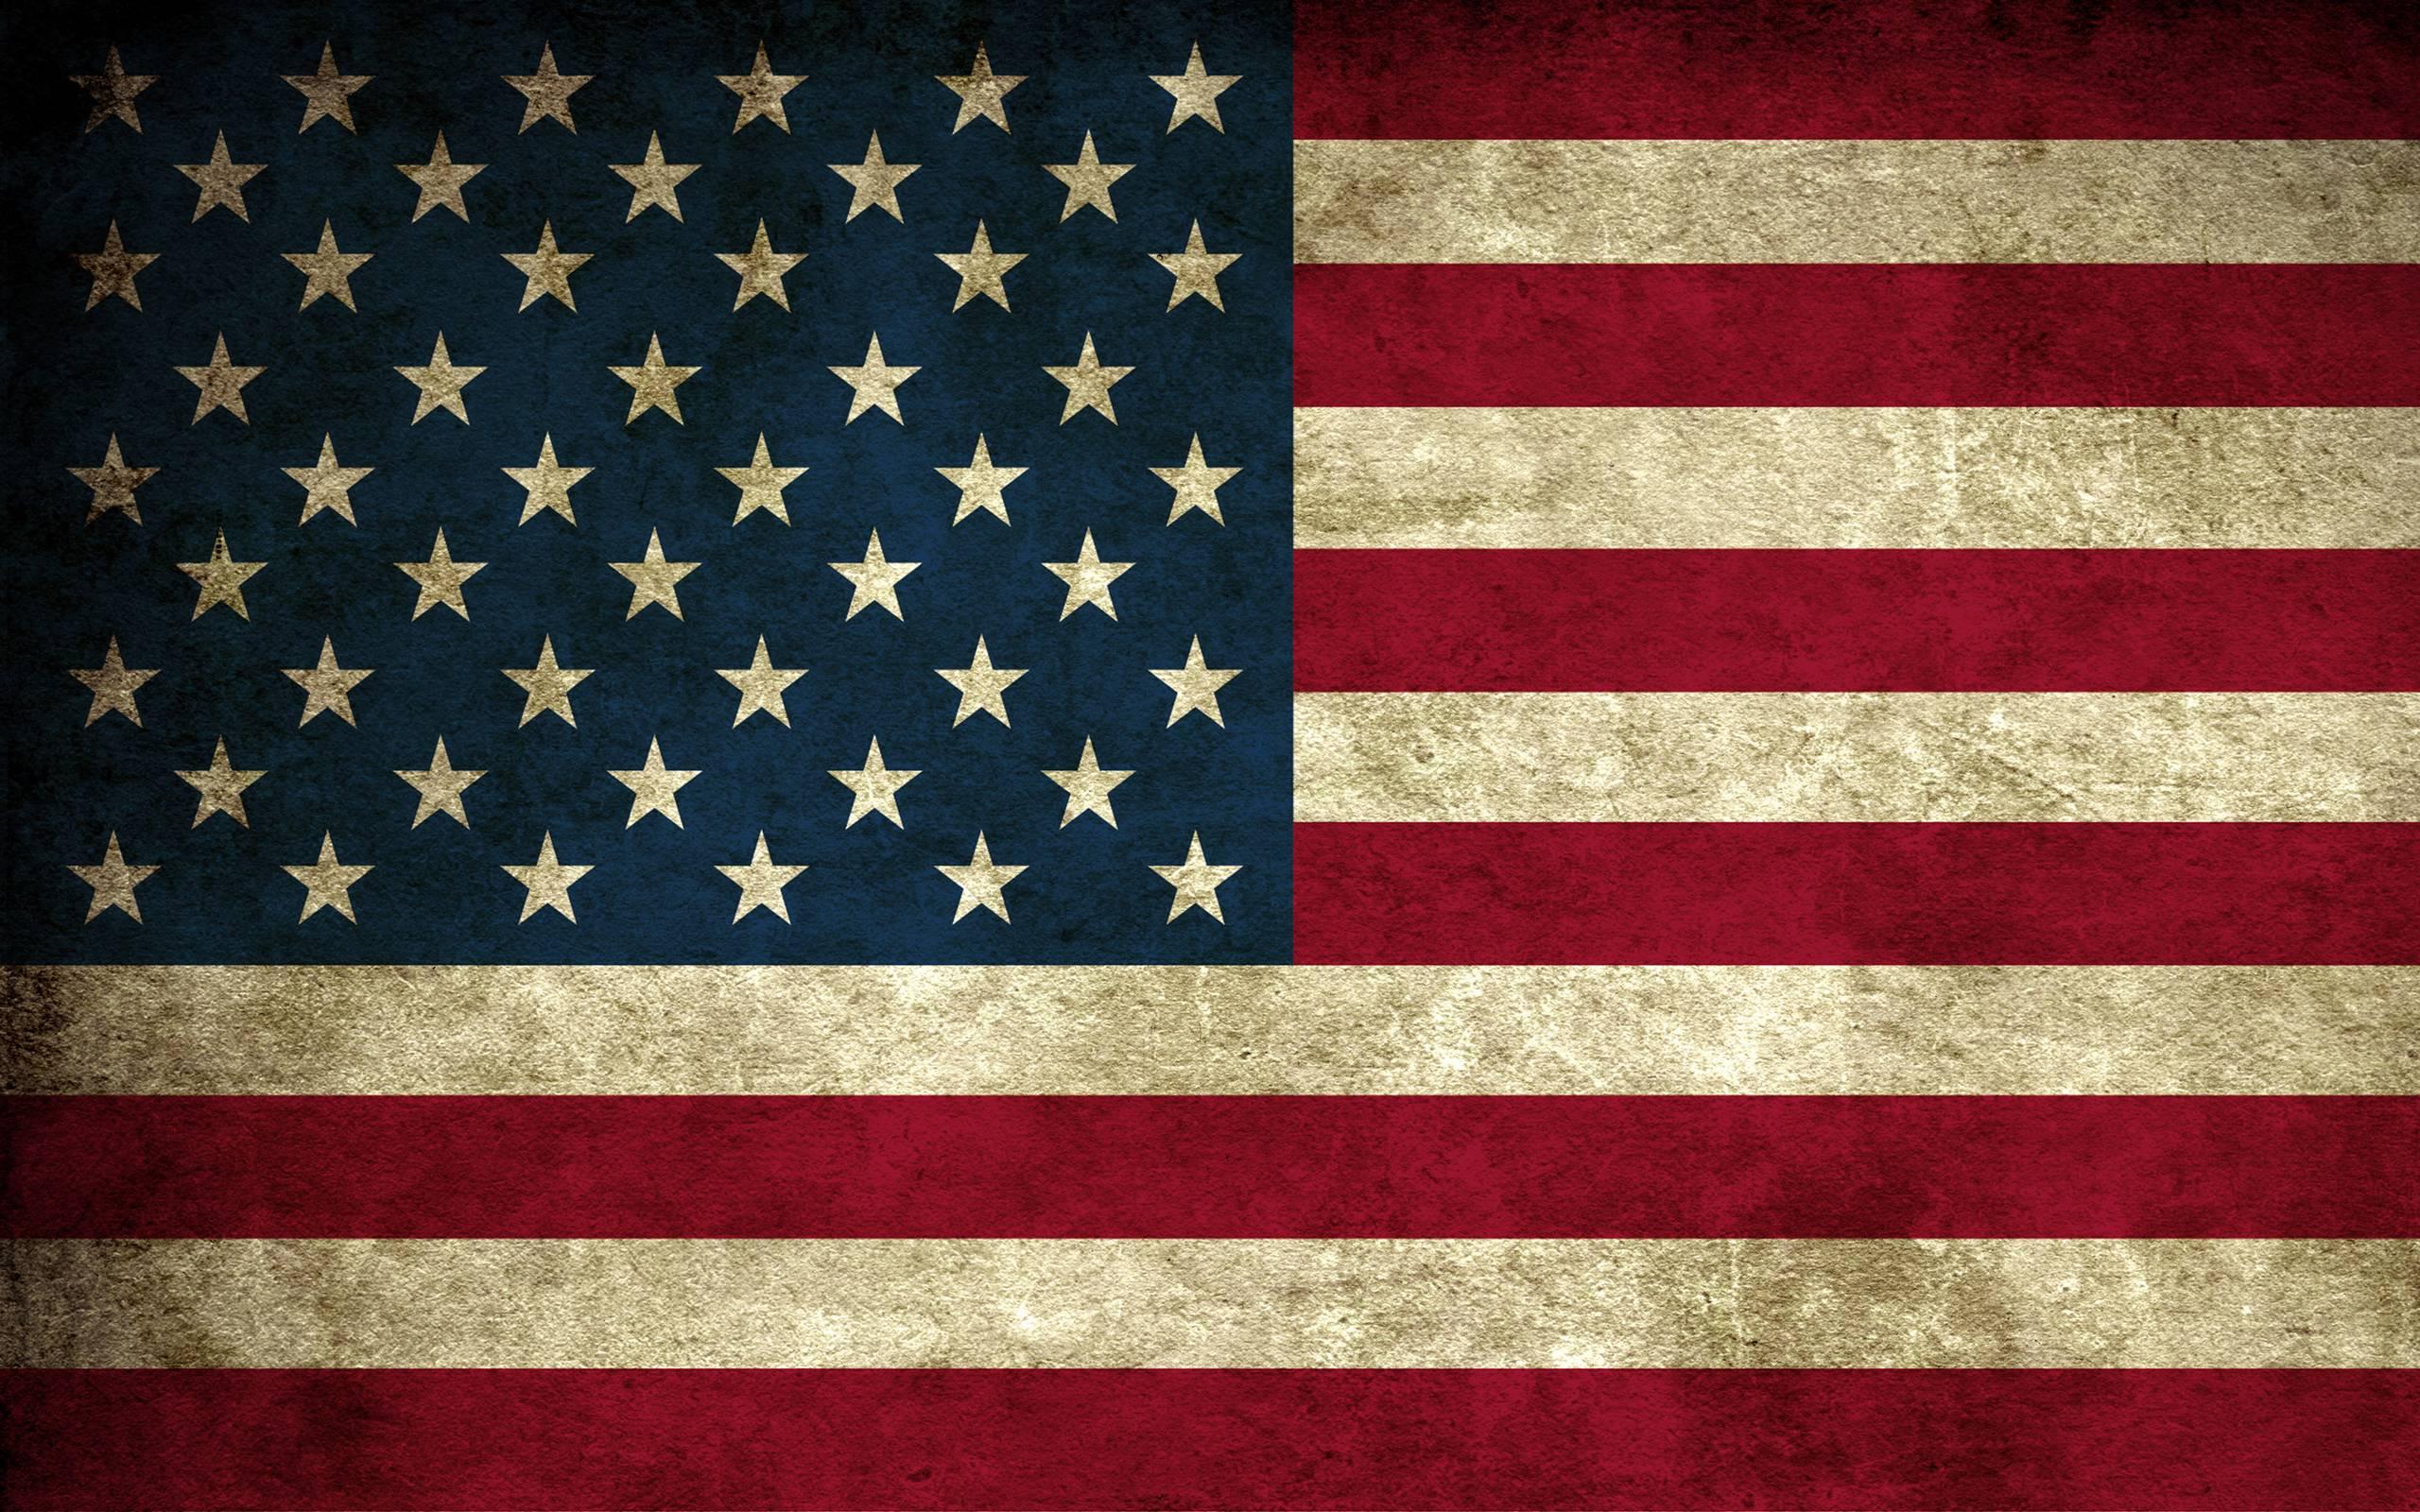 USA Flag Backgrounds 2560x1600